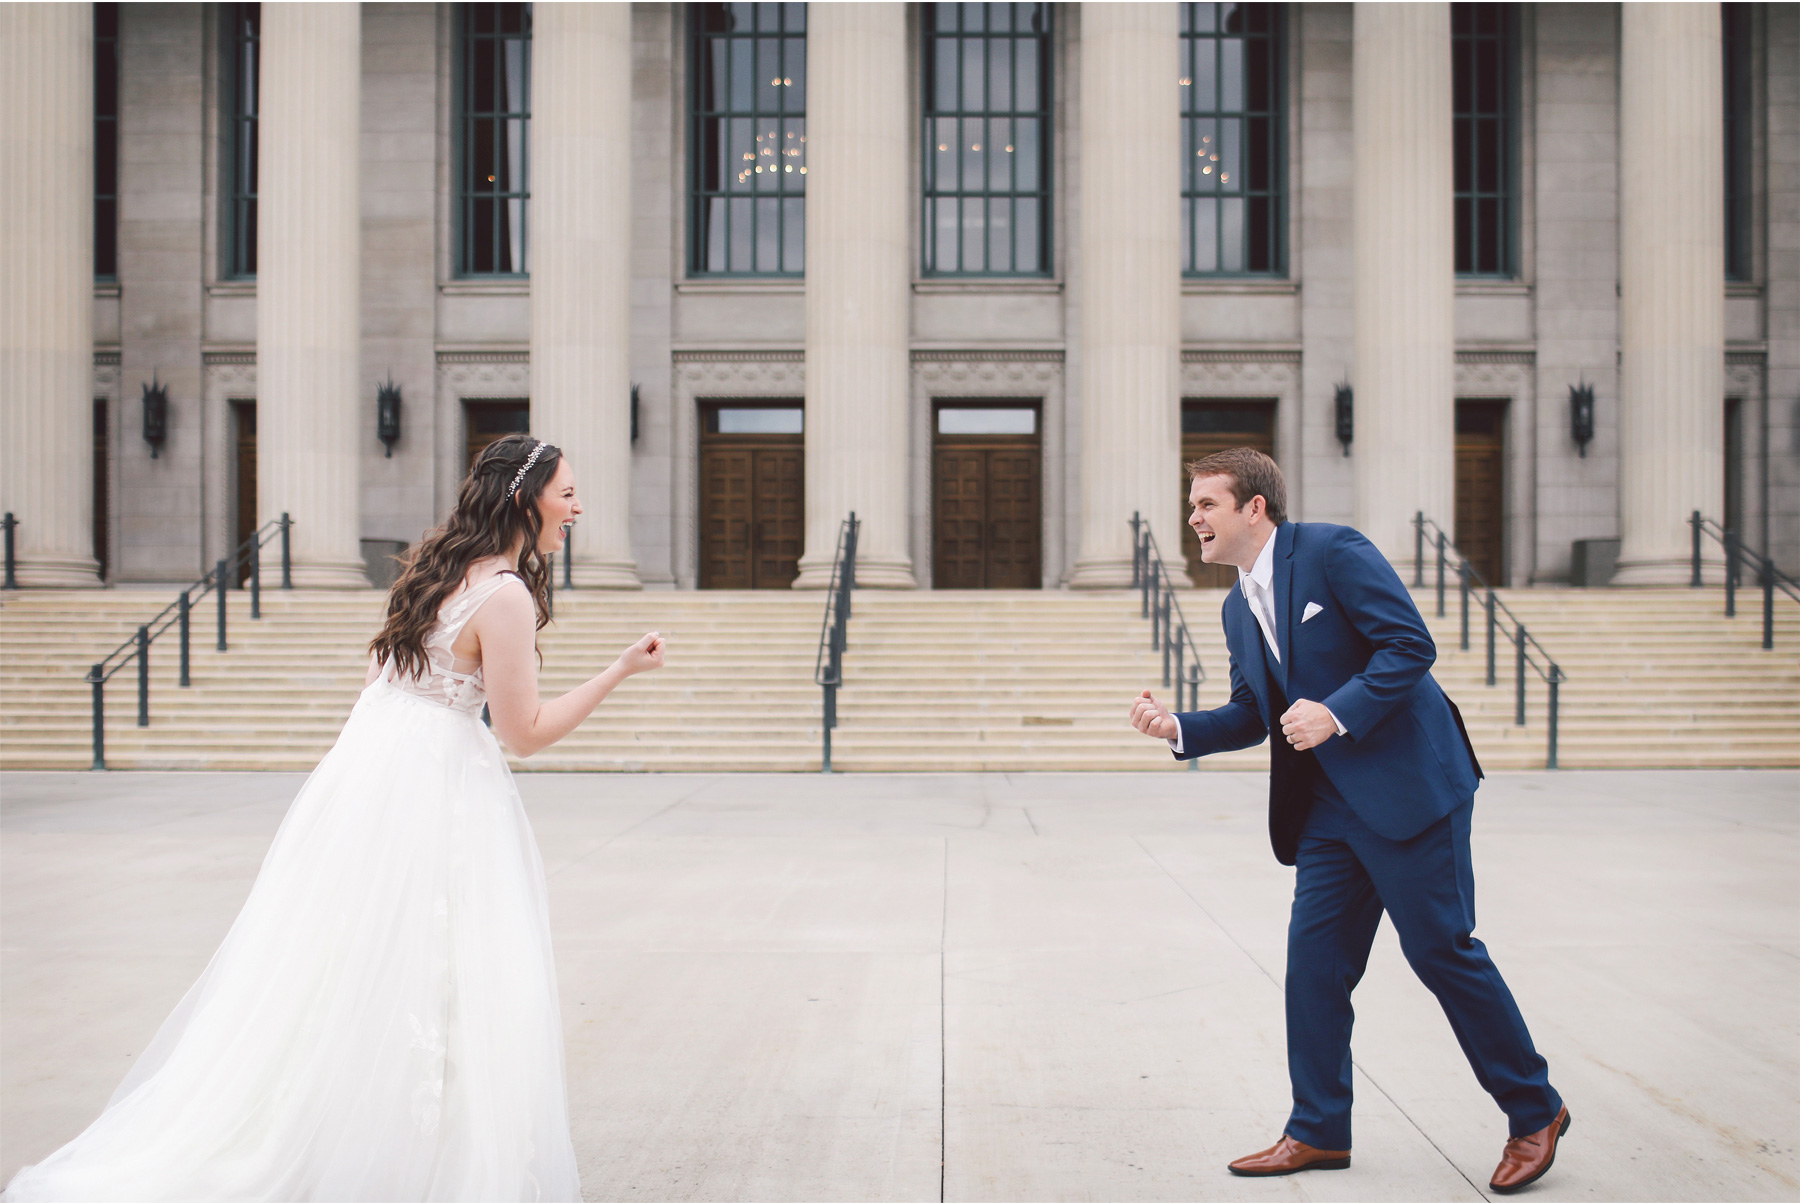 06-Saint-Paul-Minnesota-Wedding-Photography-by-Vick-Photography-Saint-Paul-Athletic-Club-First-Look-Kelsey-and-Jeffery.jpg